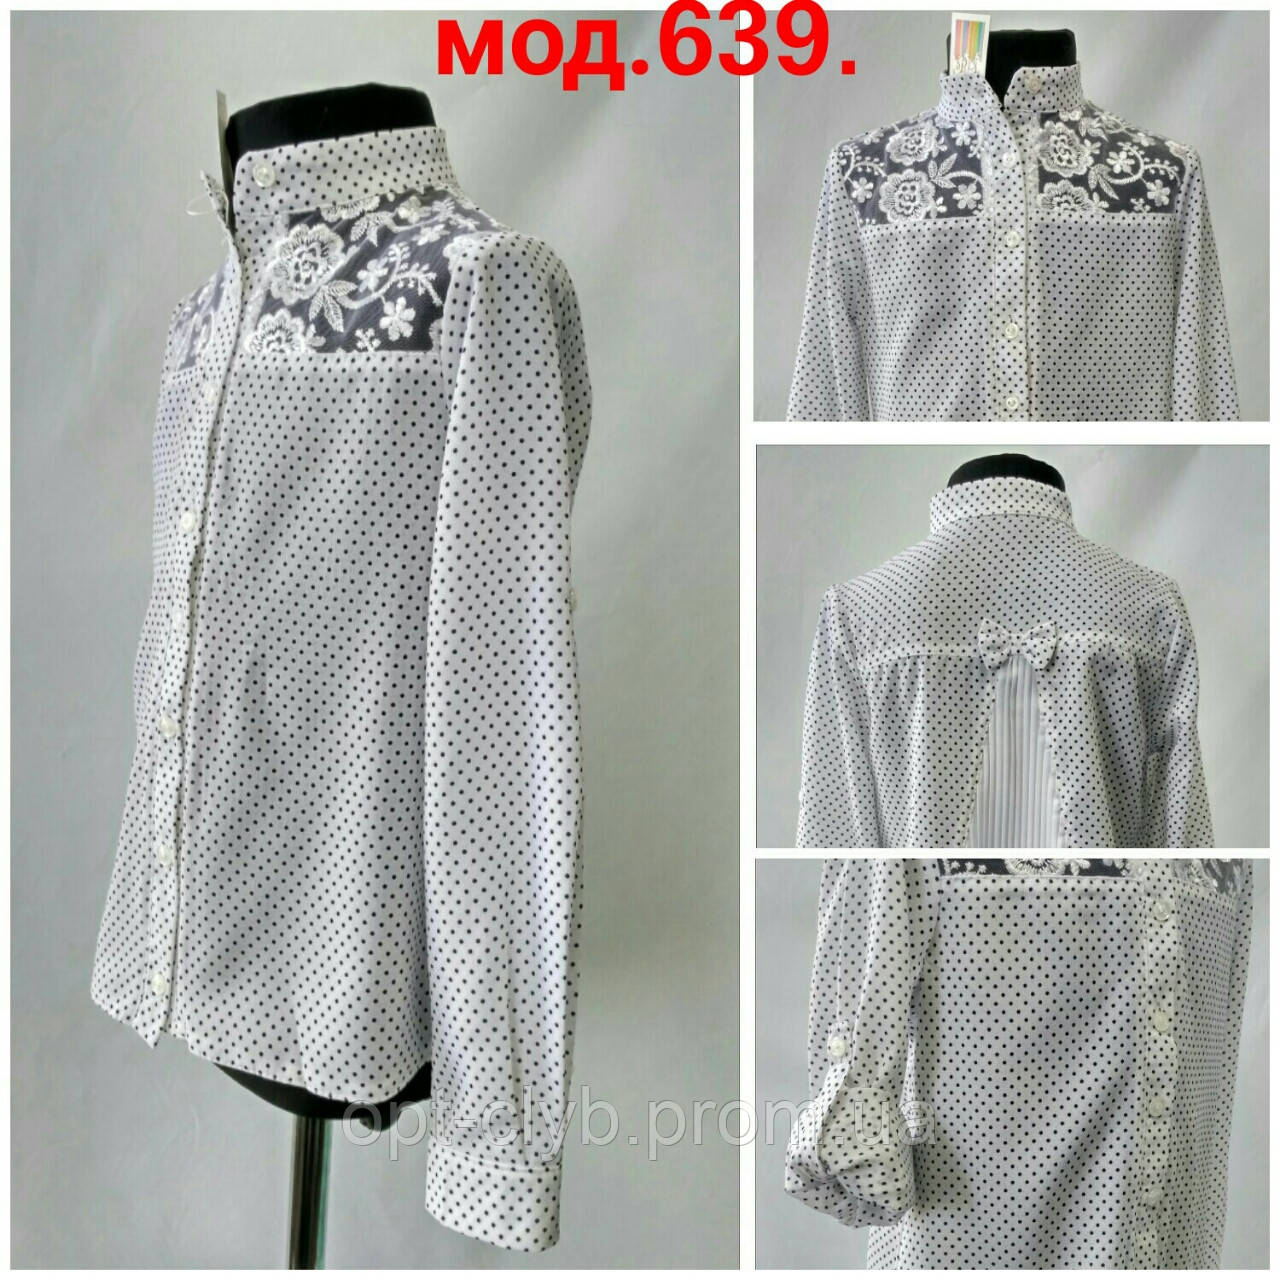 465d0cdaf95 Нарядная школьная блузка